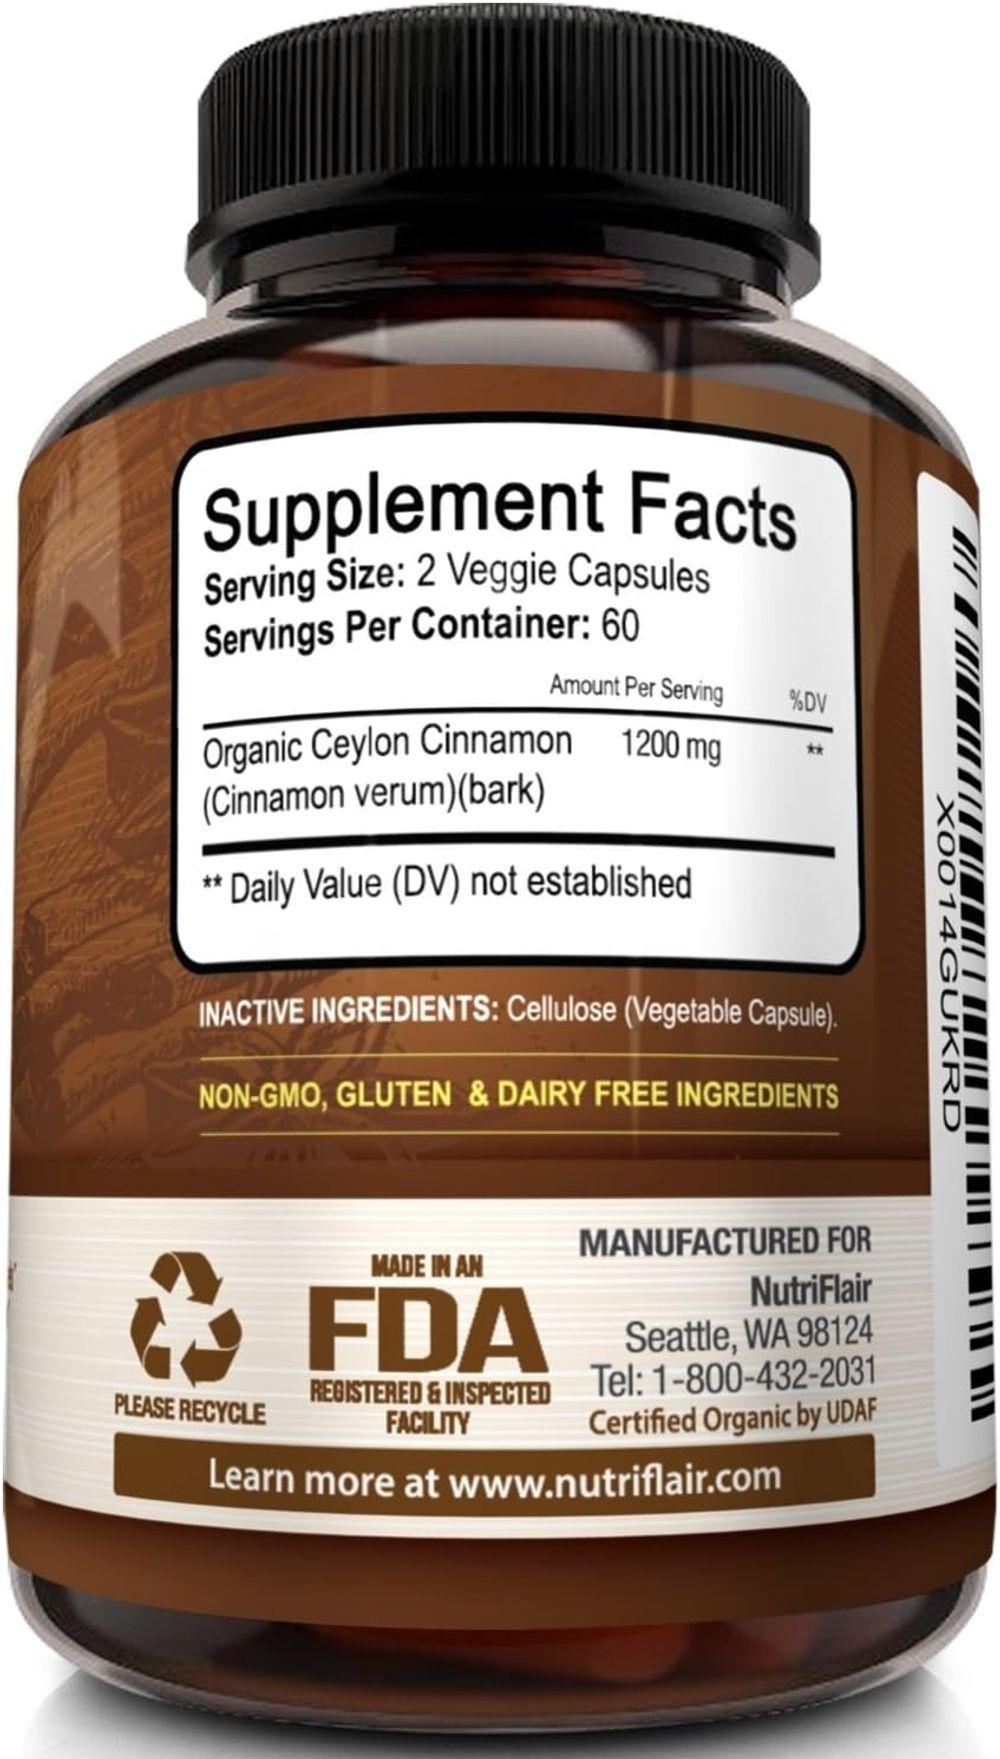 NutriFlair Ceylon Cinnamon (Made with Organic Ceylon Cinnamon) 1200mg per Serving, 120 Capsules - Healthy Blood Sugar Support, Joint Support, Anti-inflammatory & Antioxidant - True Sri Lanka Cinnamon